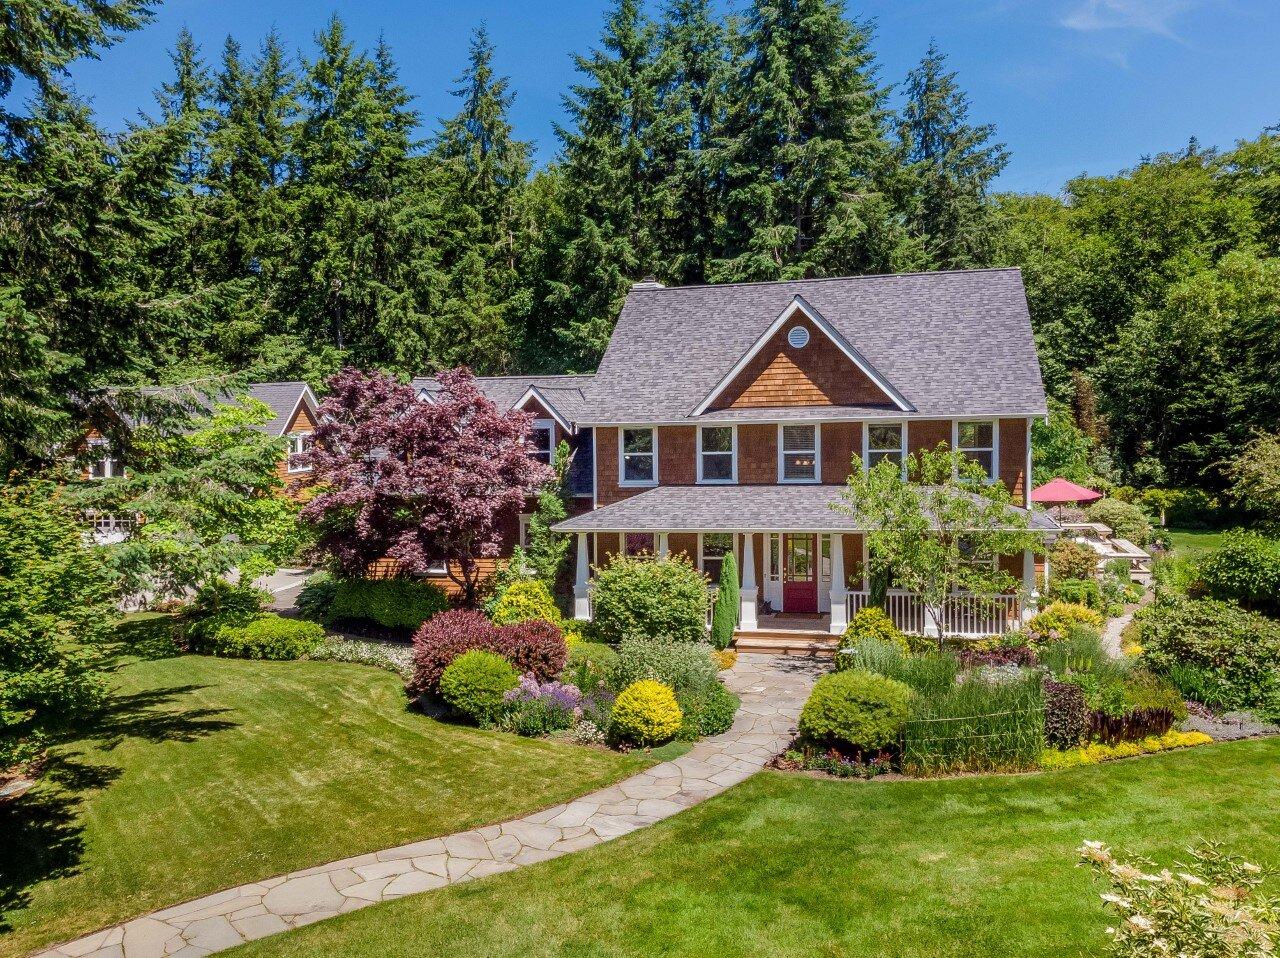 ** 14522 Chesapeake Place NE, Bainbridge Island | Sold for $1,389,000